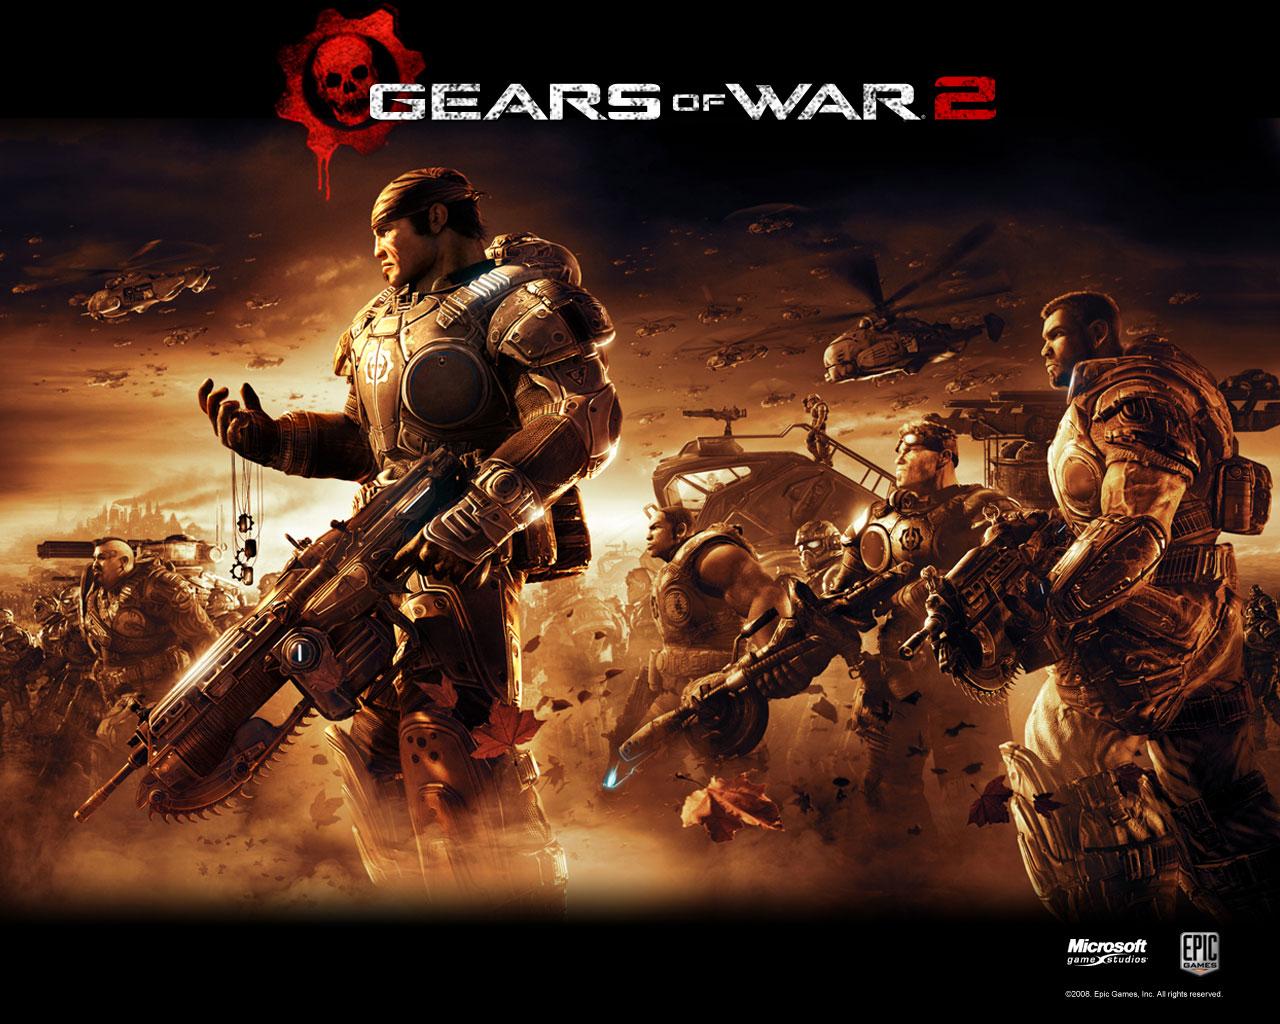 http://3.bp.blogspot.com/_JGOVNEOefWI/TMYP_Fo85YI/AAAAAAAAAAc/zh0I6kELJsc/s1600/gears_of_war_2_wallpaper3_mooki.jpg